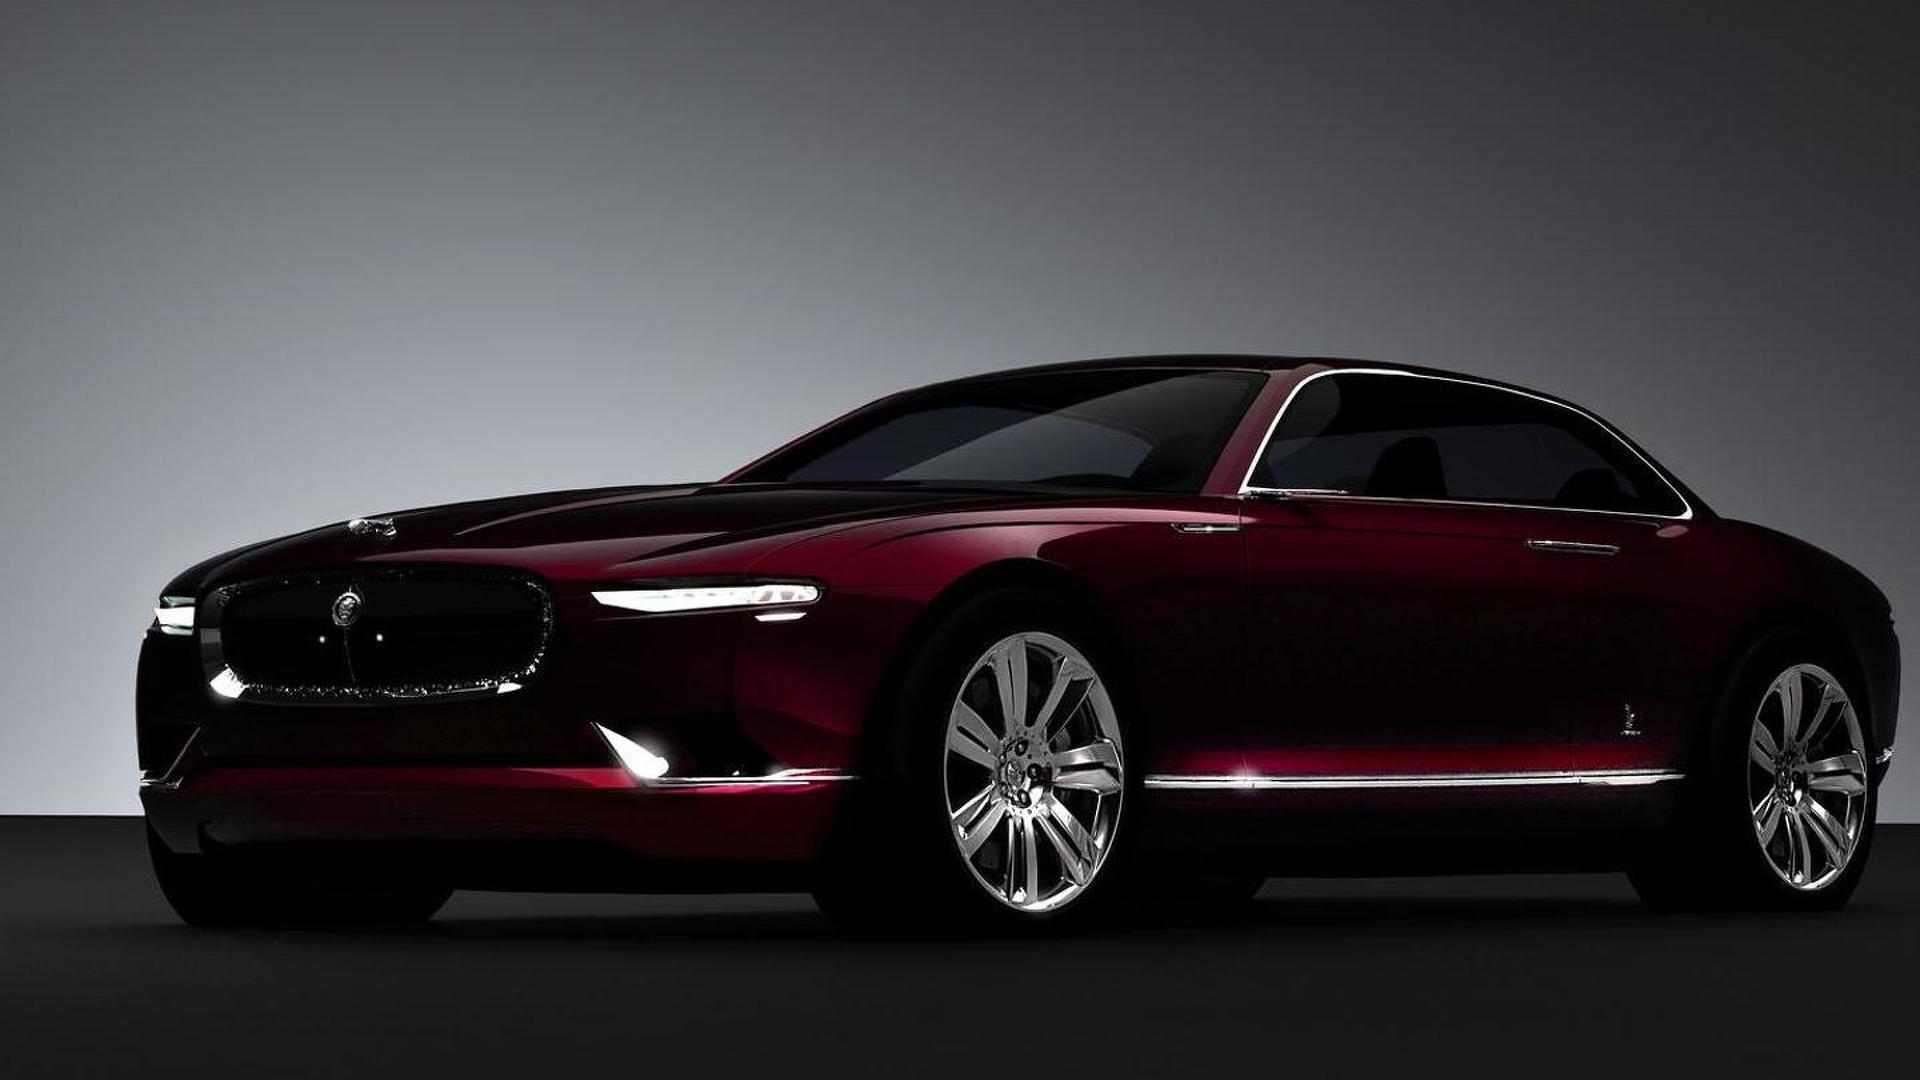 Jaguar boss hints at entry-level sedan and crossover